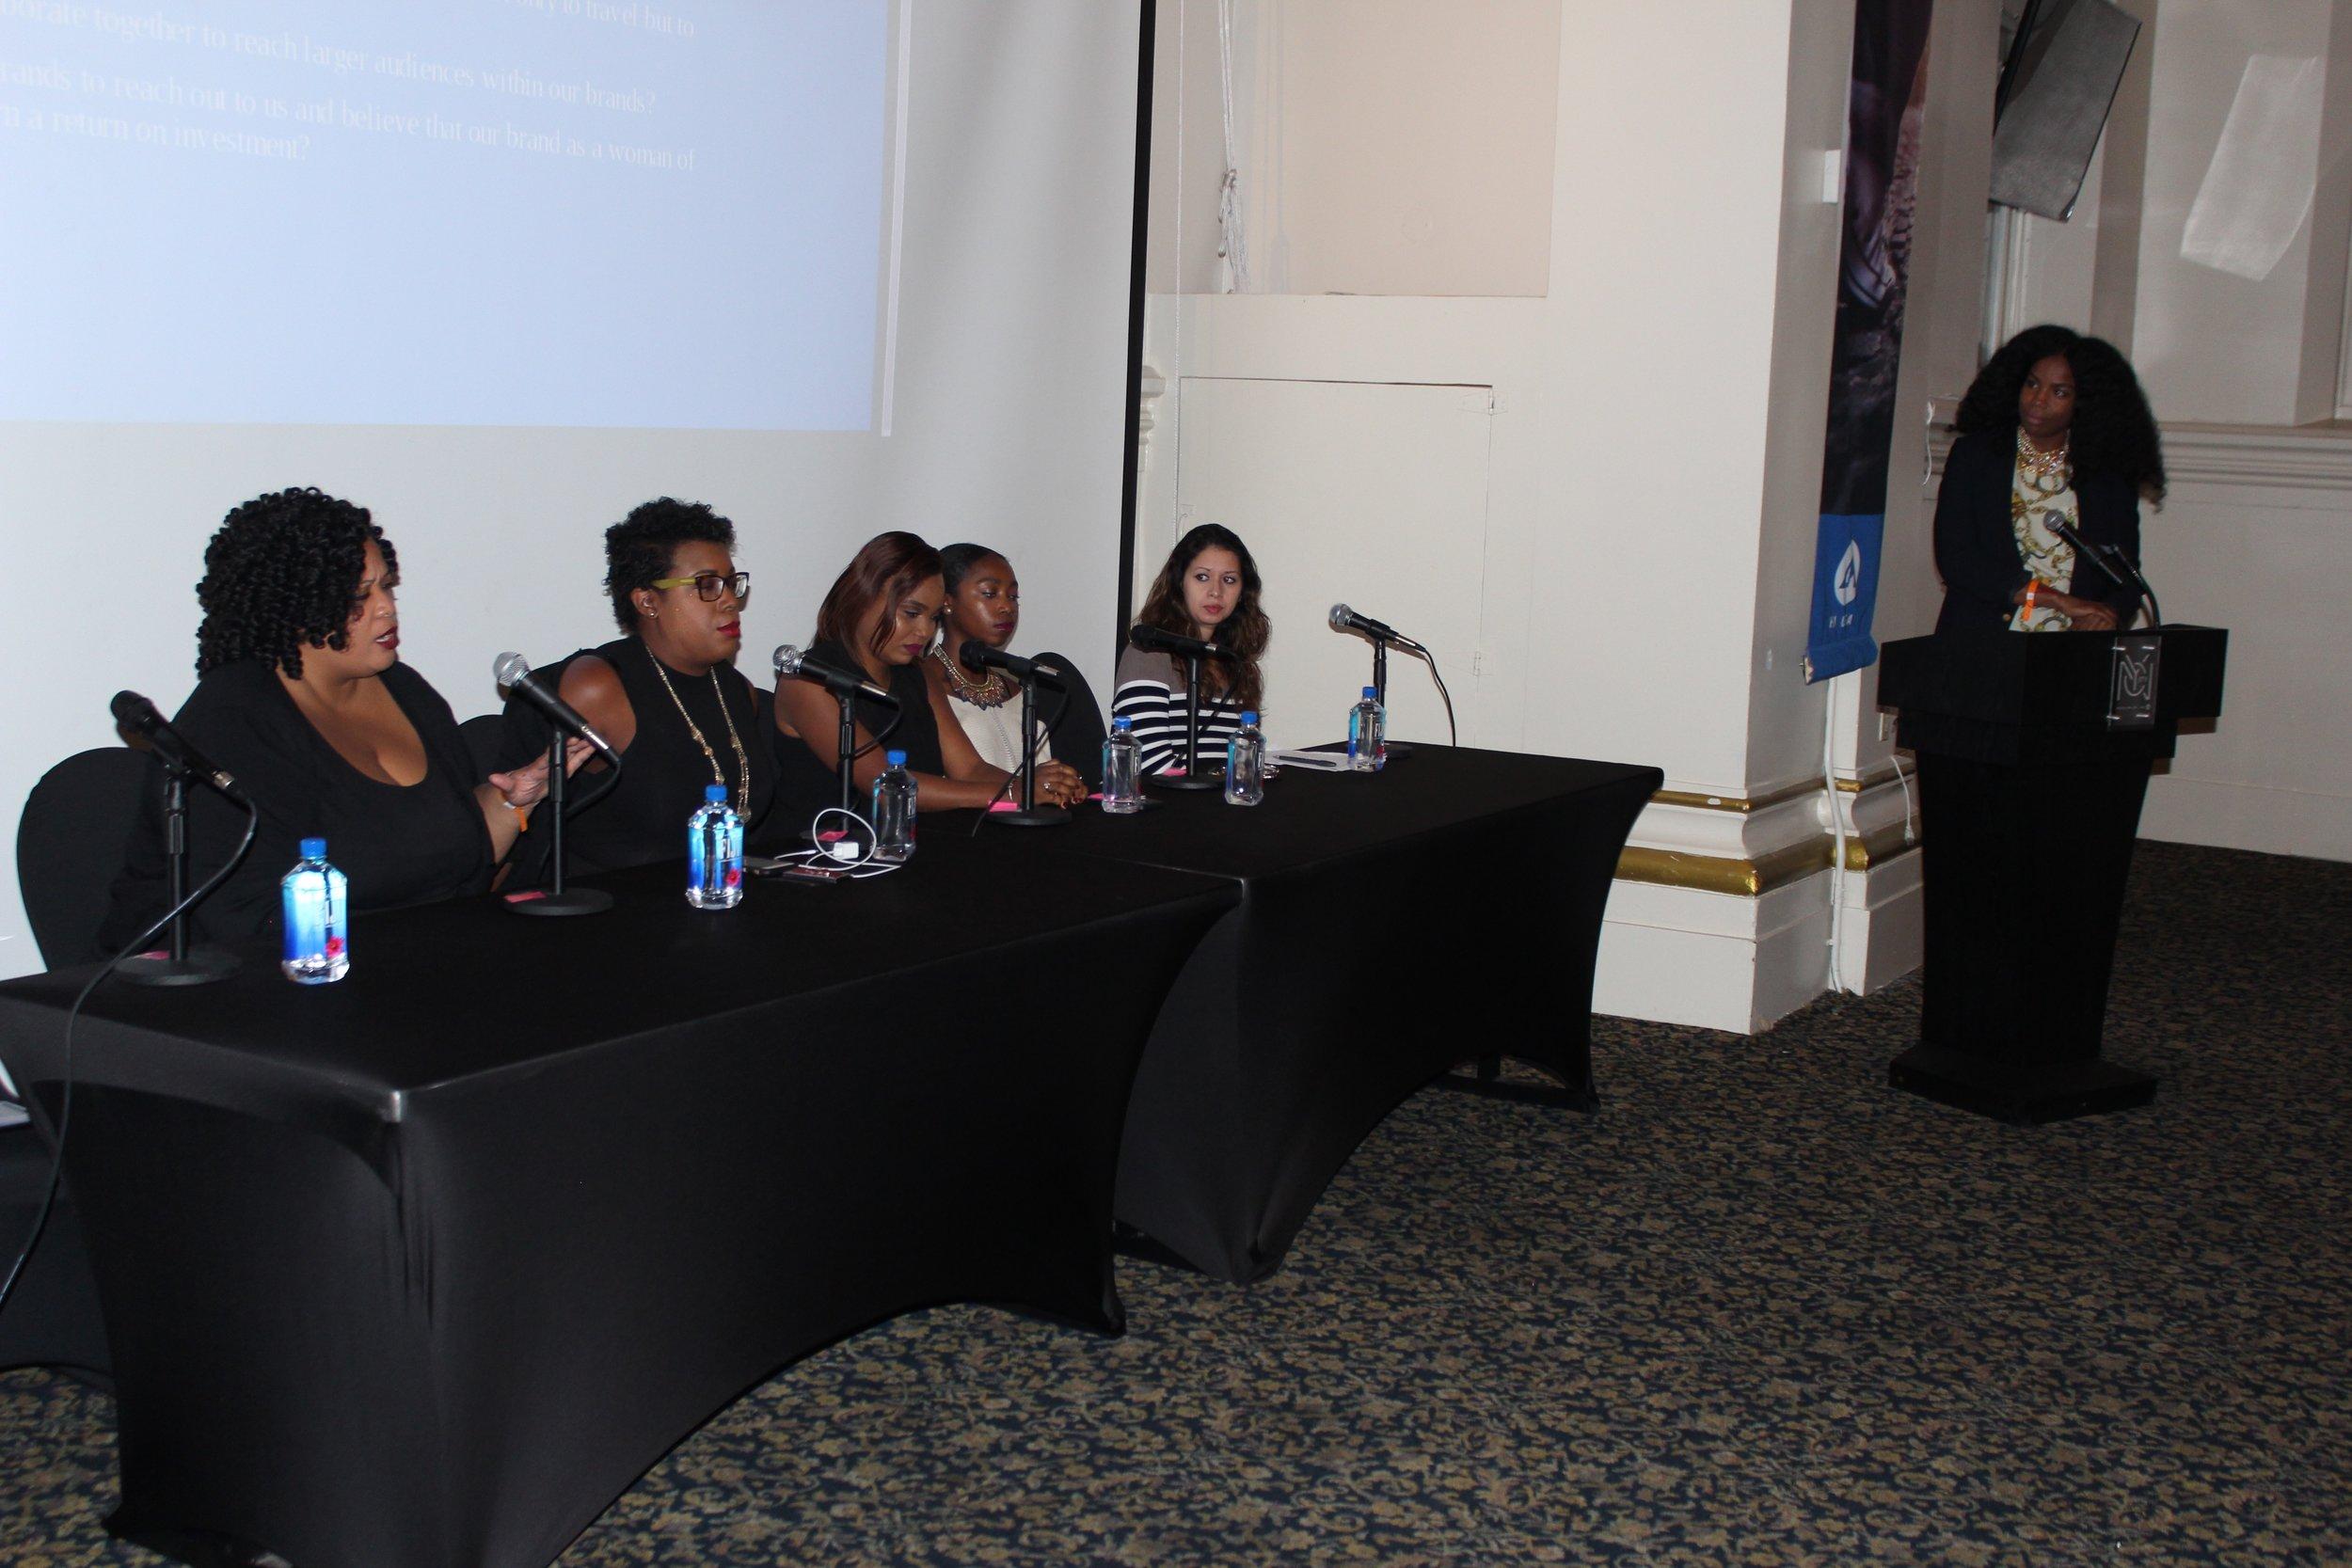 Left to Right: Kimberly Wilson, Yvonne Pearson, Keisha Nelson, Imani Rodman, Diana Limongi, Felice Leon